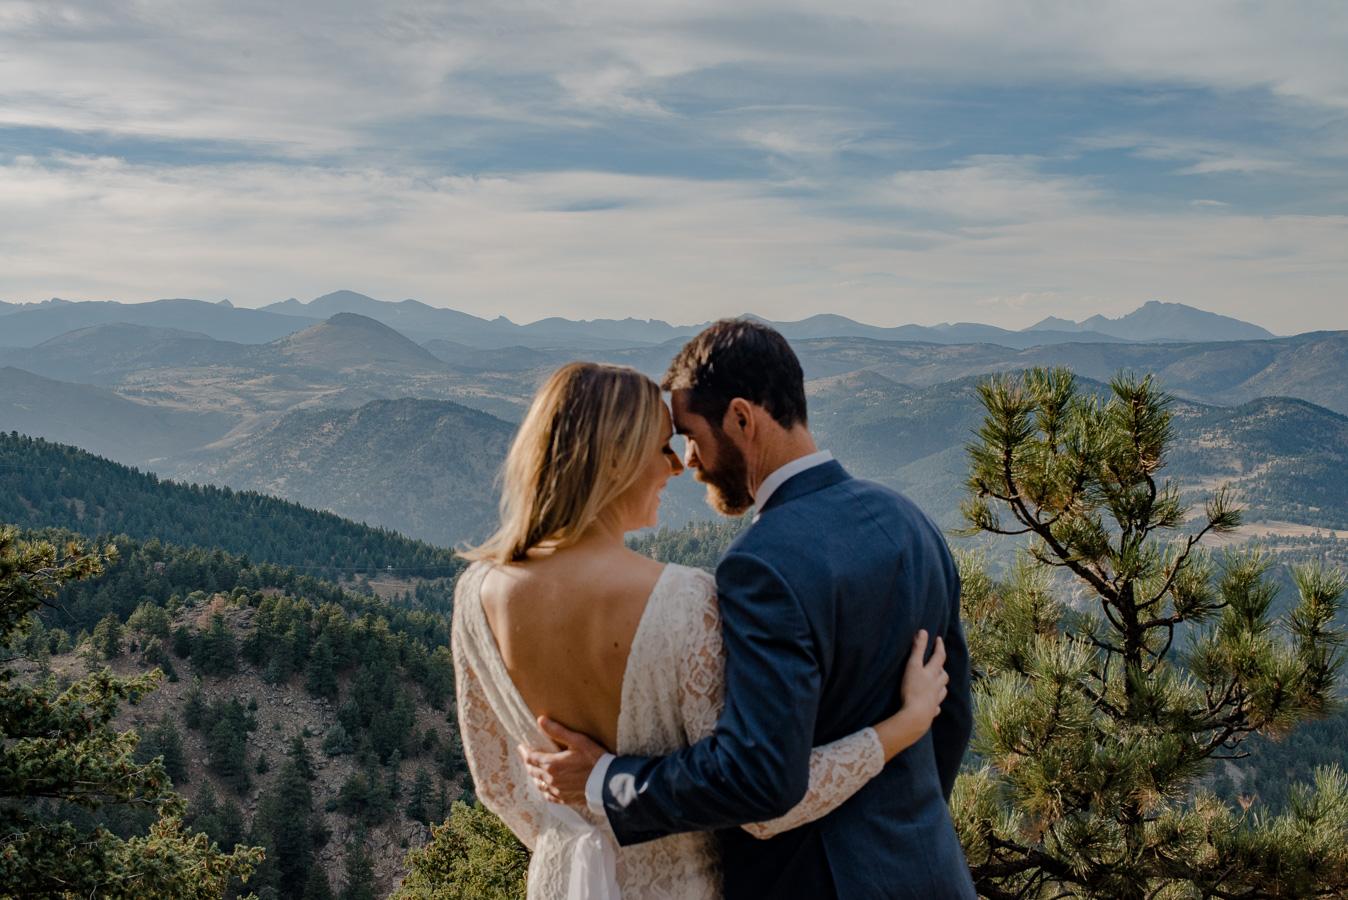 001Jessica&Adam-intimate-wedding-flagstaff-house-boulder-elopement-colorado-photography-519.jpg